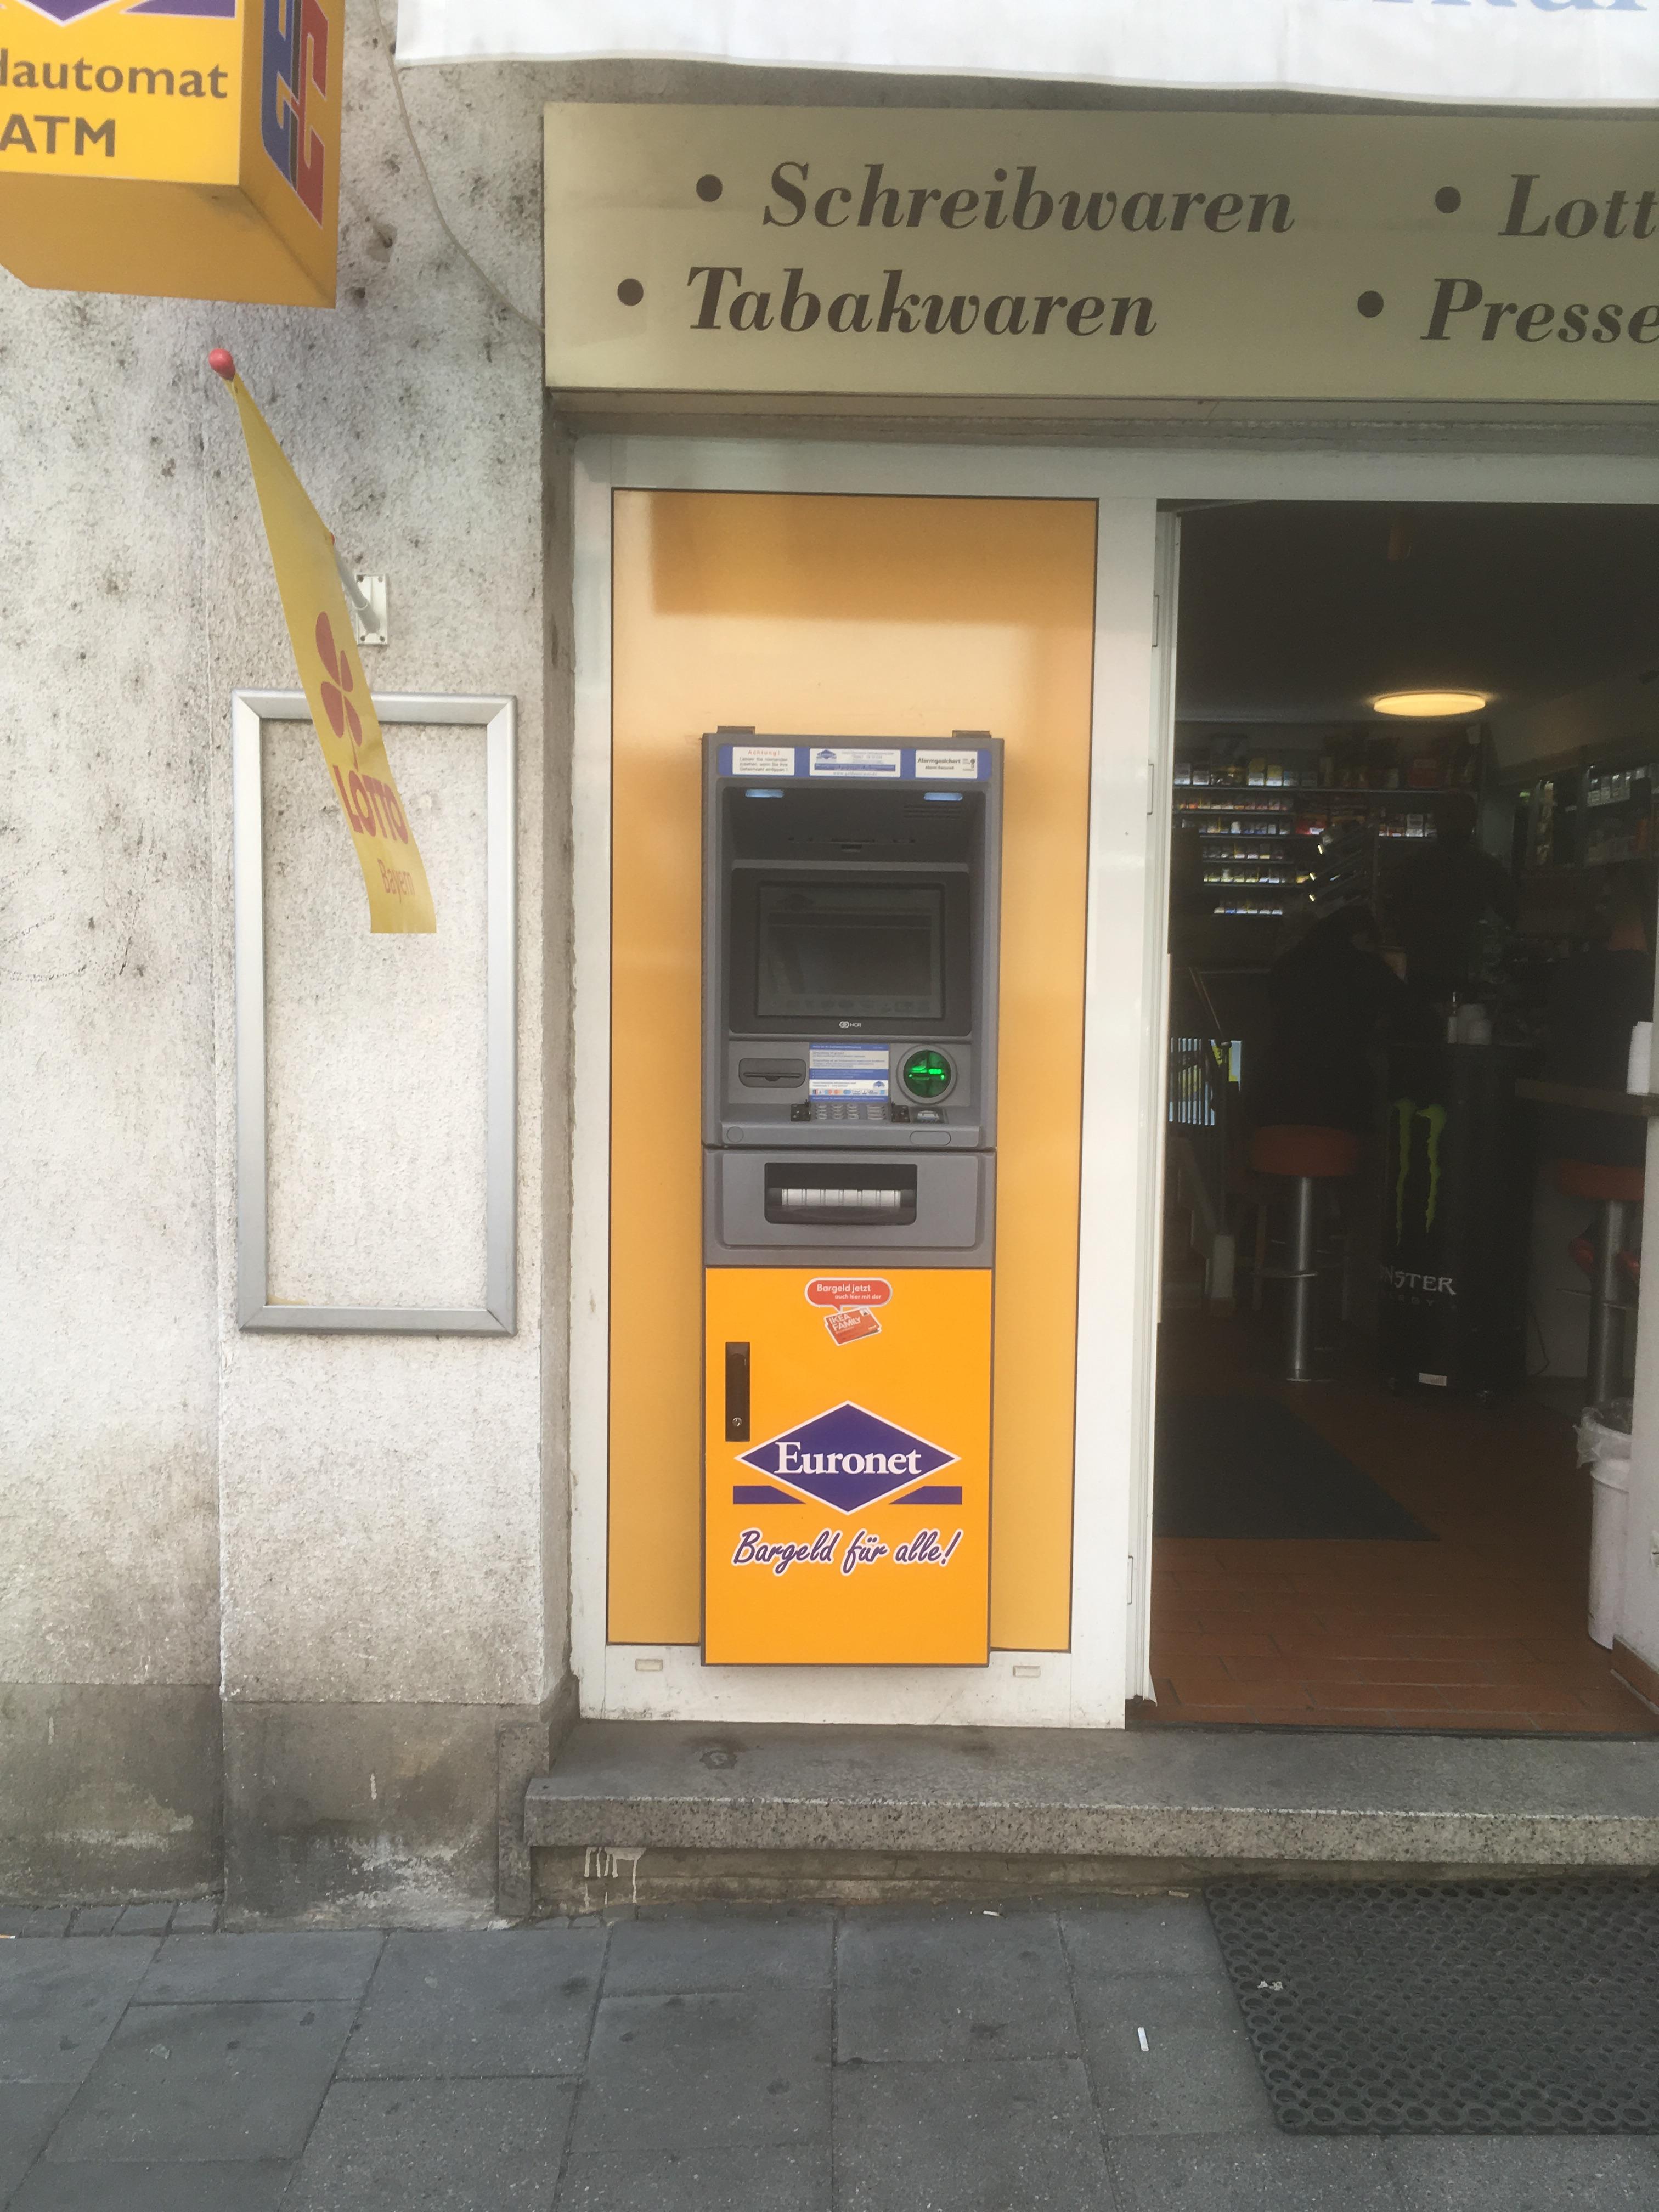 Foto de Euronet - Geldautomat - ATM